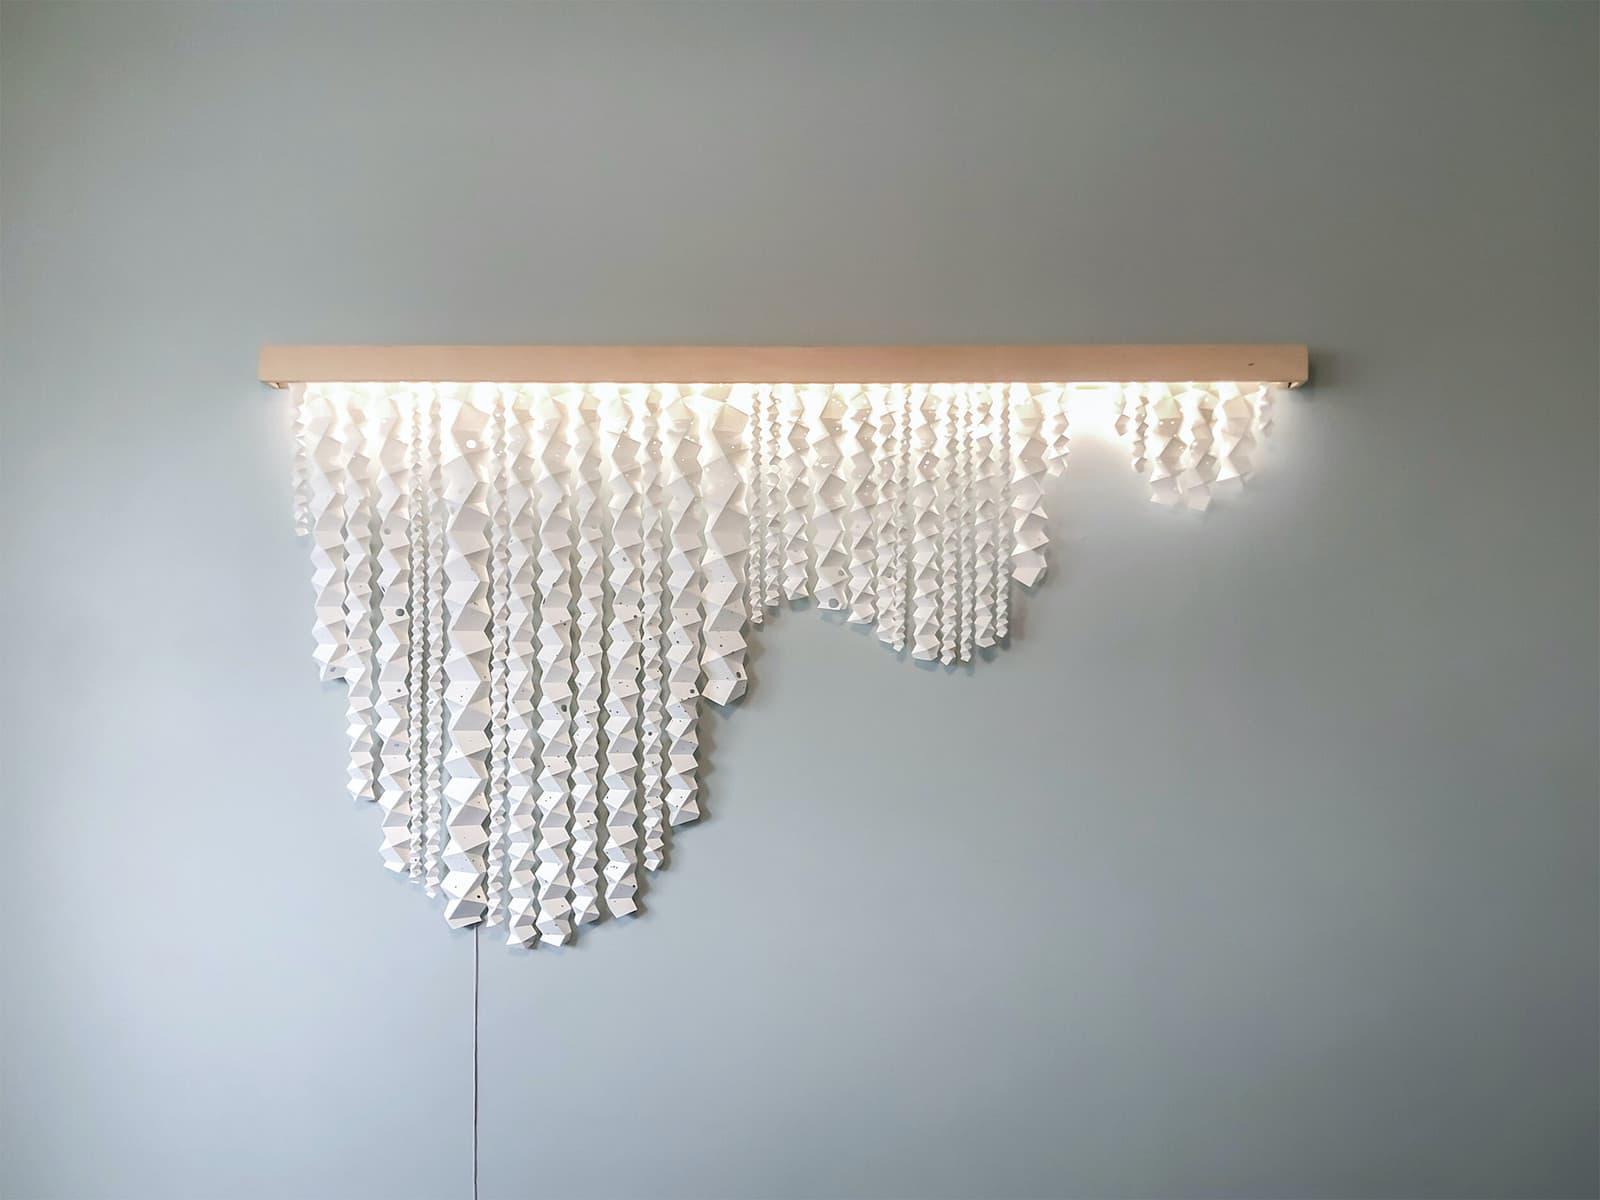 Zai Divecha Papierskulpturen Design